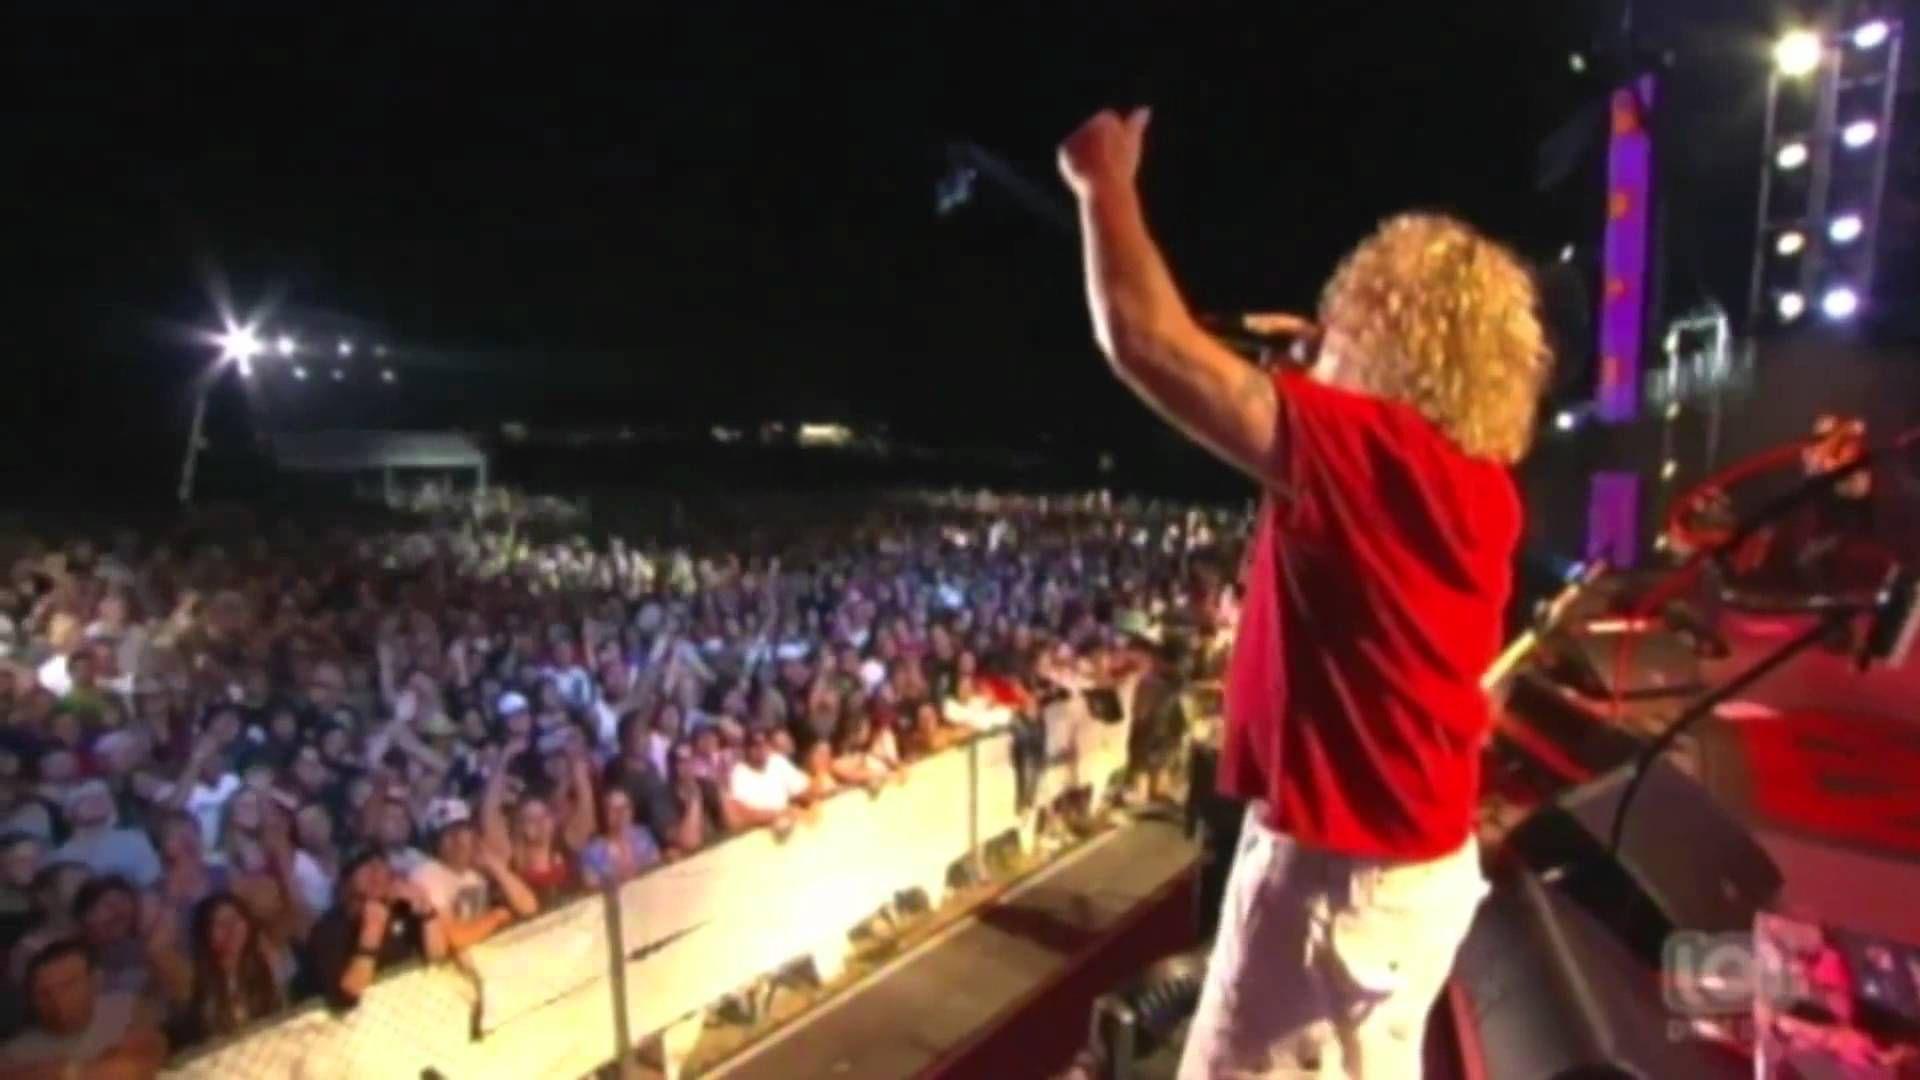 Sammy Hagar Mas Tequila Live 2010 Love This Song 3 Sammy Hagar Love Songs Youtube